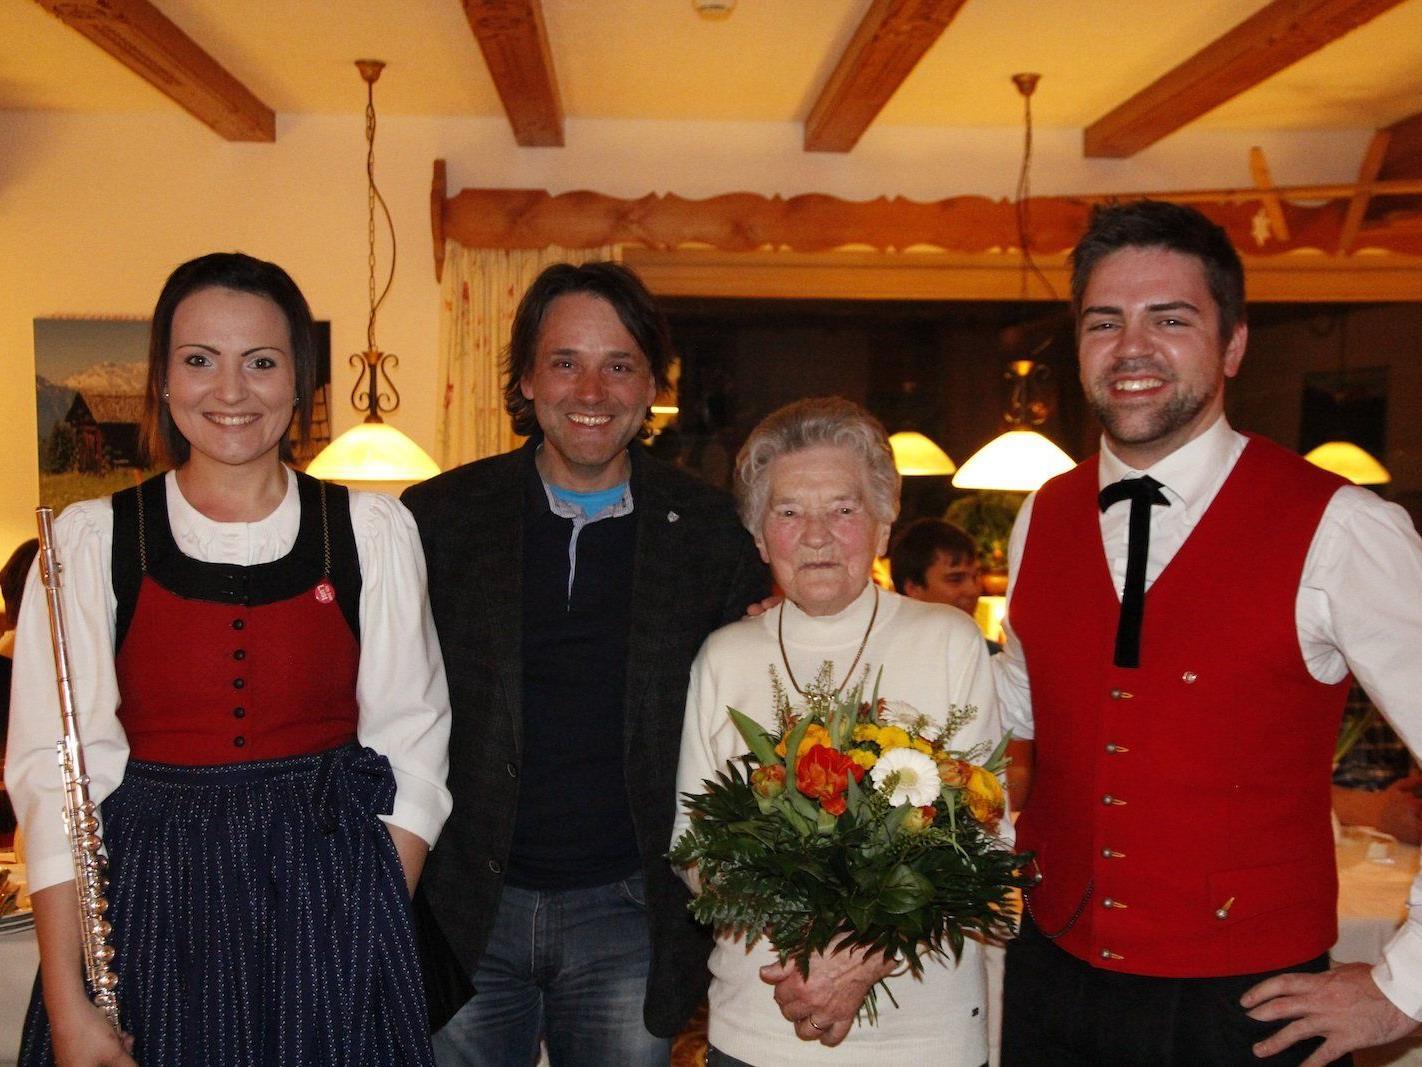 V.l. Obfrau Jasmin Bargehr, Bürgermeister Thomas Zudrell, Jubilarin Borgi Dönz, Obmann Patrick Zudrell